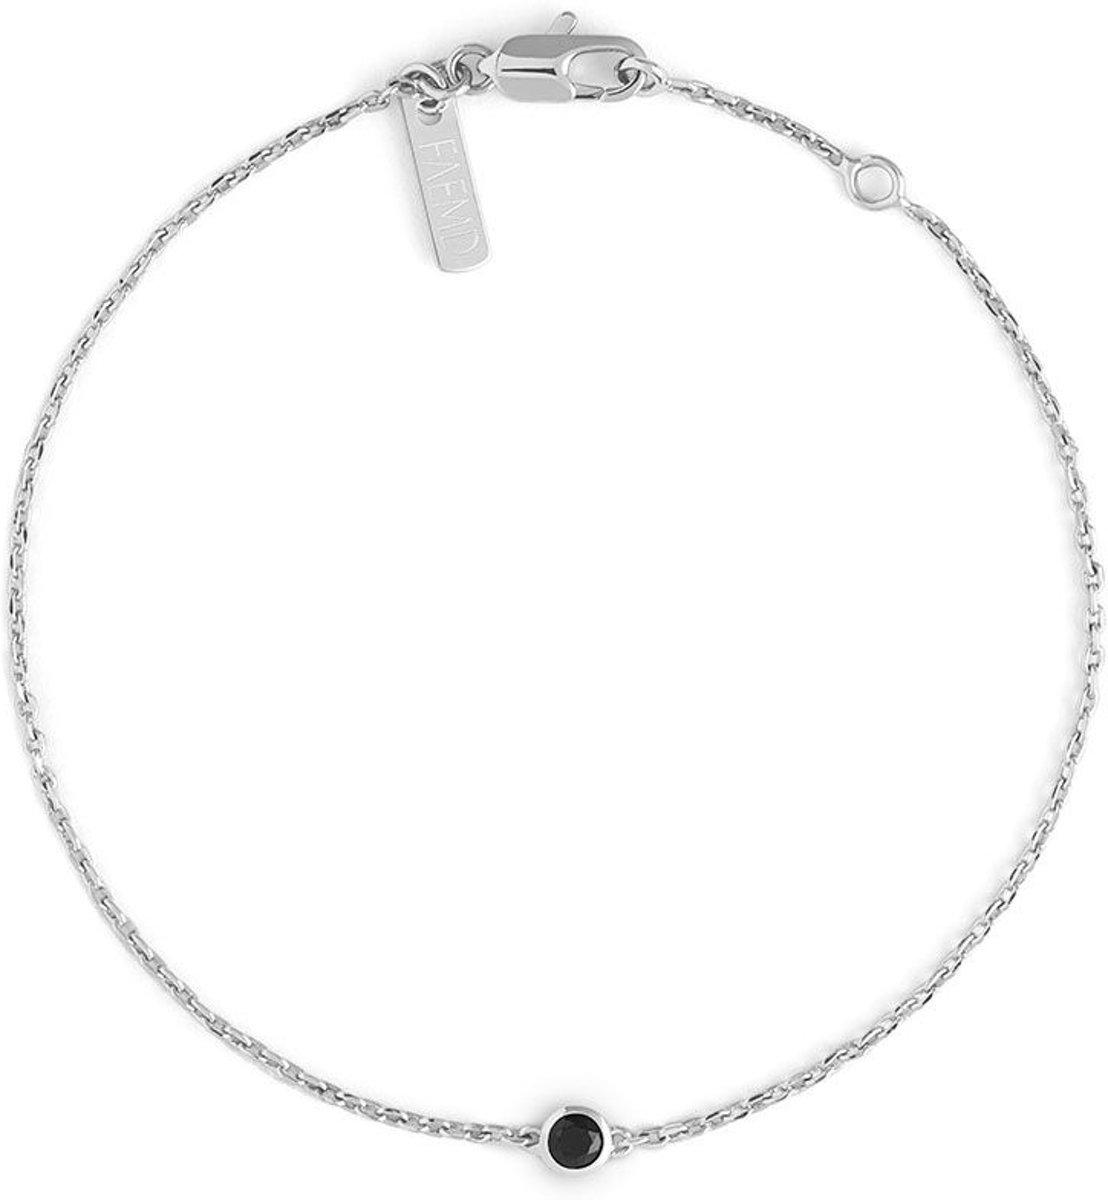 FAEMD Black Stud Bracelet - Dames - Armband - Zilver - Minimalistisch